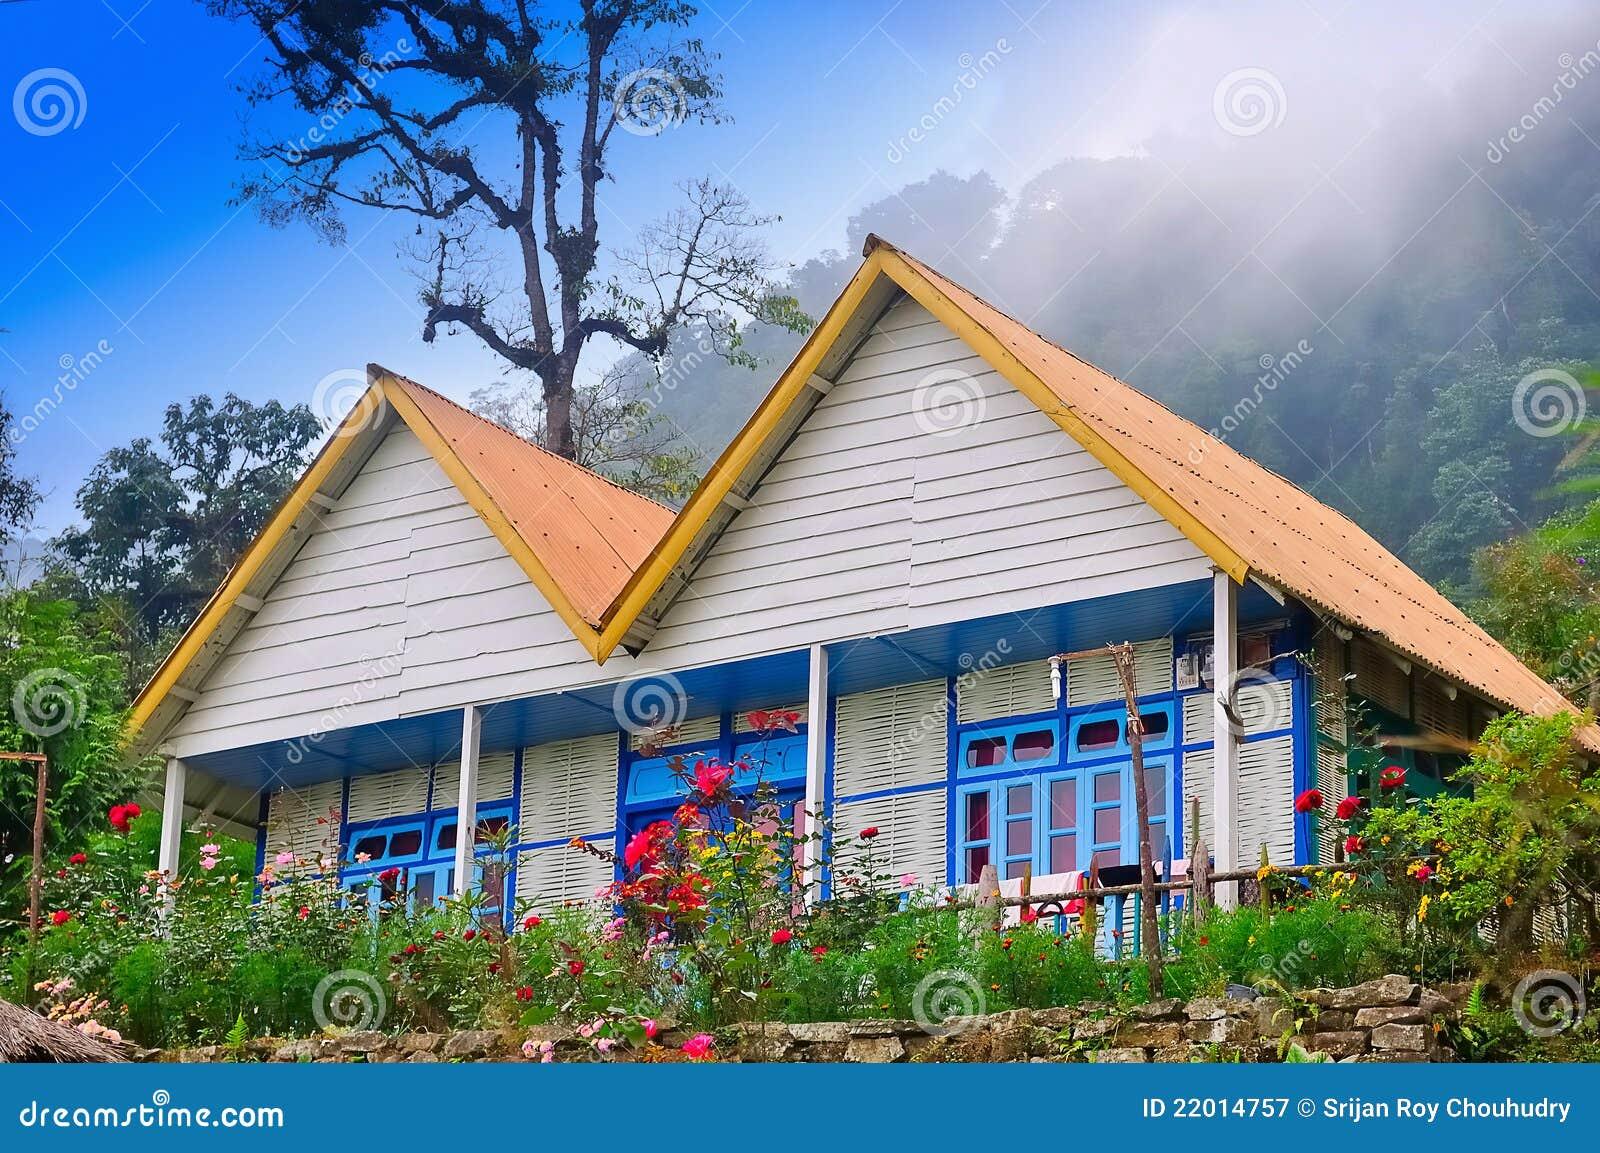 Maison Et Jardin, Pierre, Hublot, Bambou, Nuage Image stock - Image ...